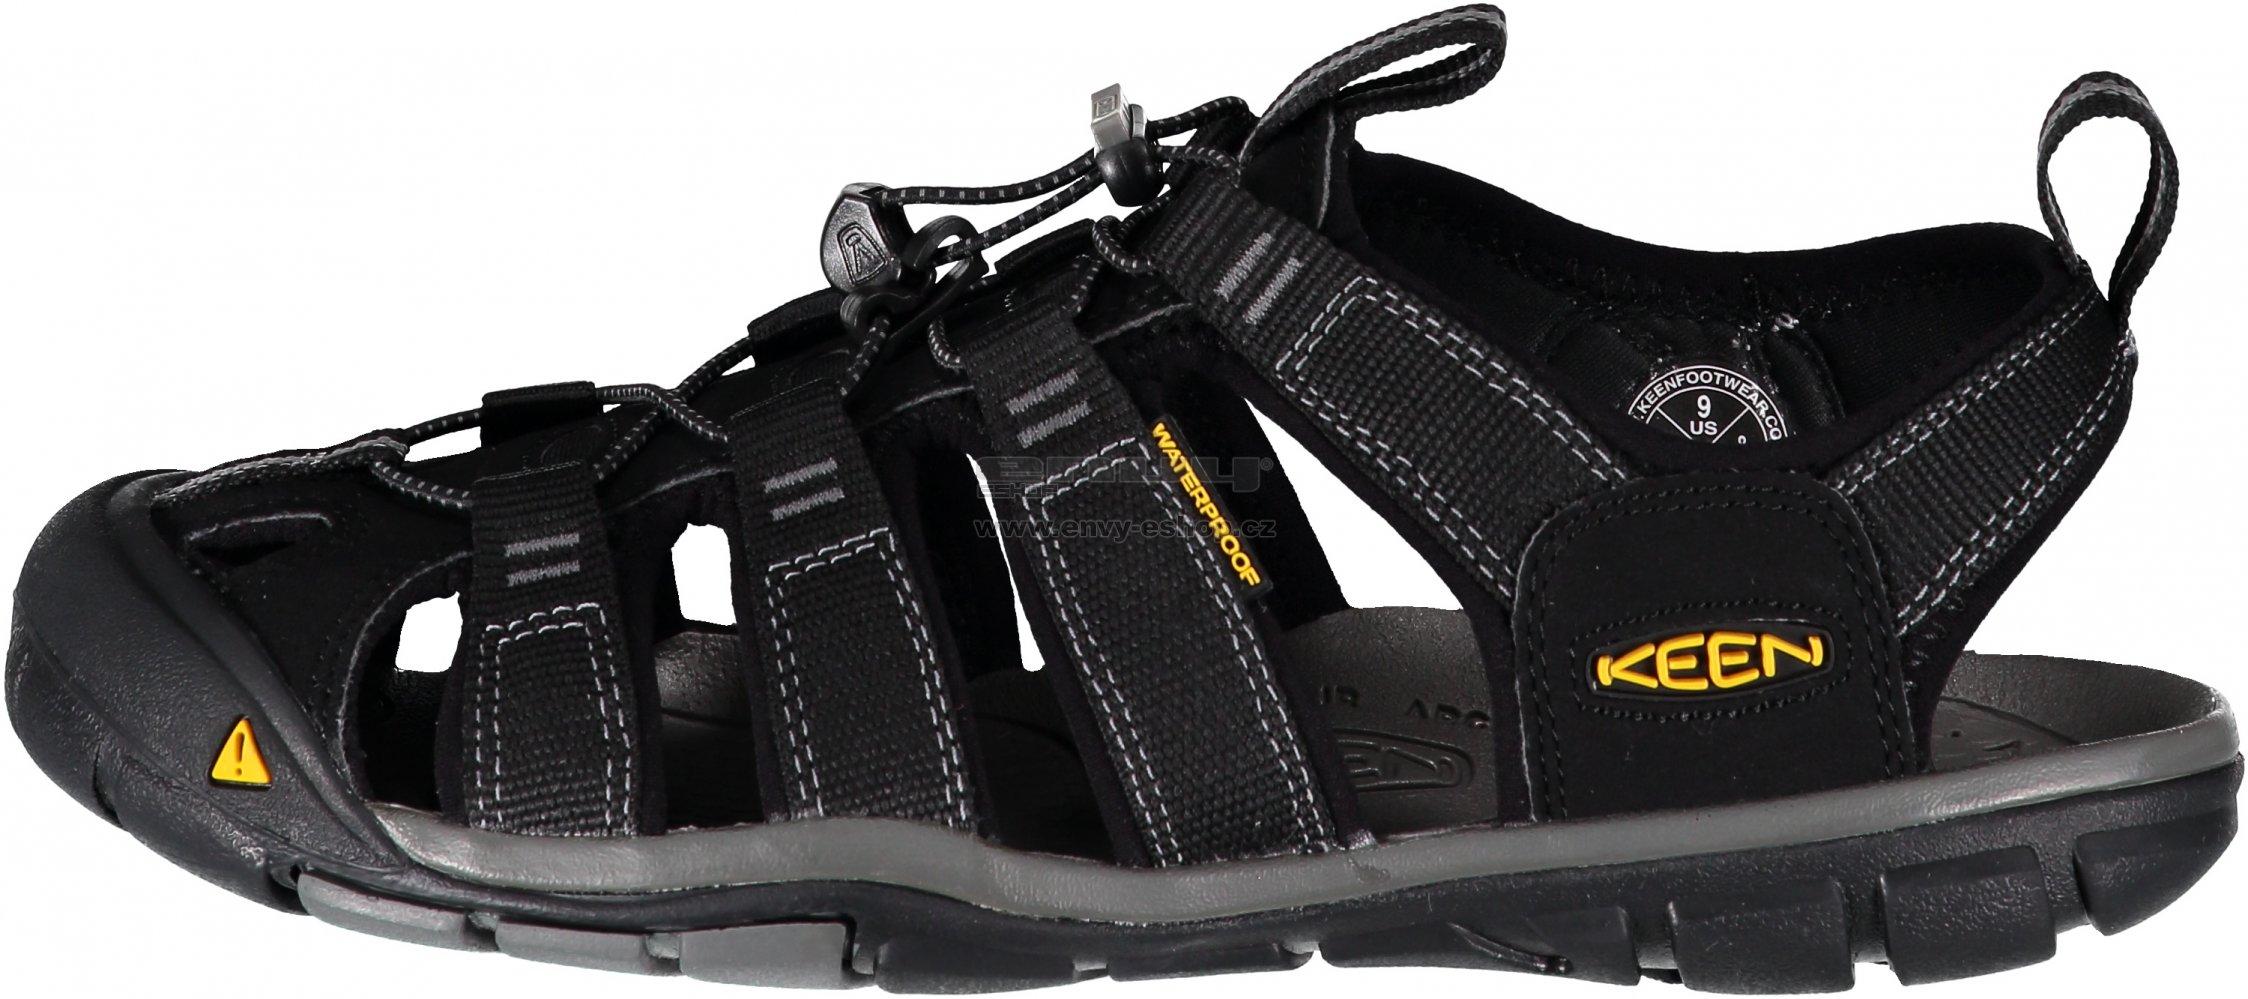 8e36f7219038 Pánské sandále KEEN CLEARWATER CNX M BLACK GARGOYLE velikost  44 ( 9 ...